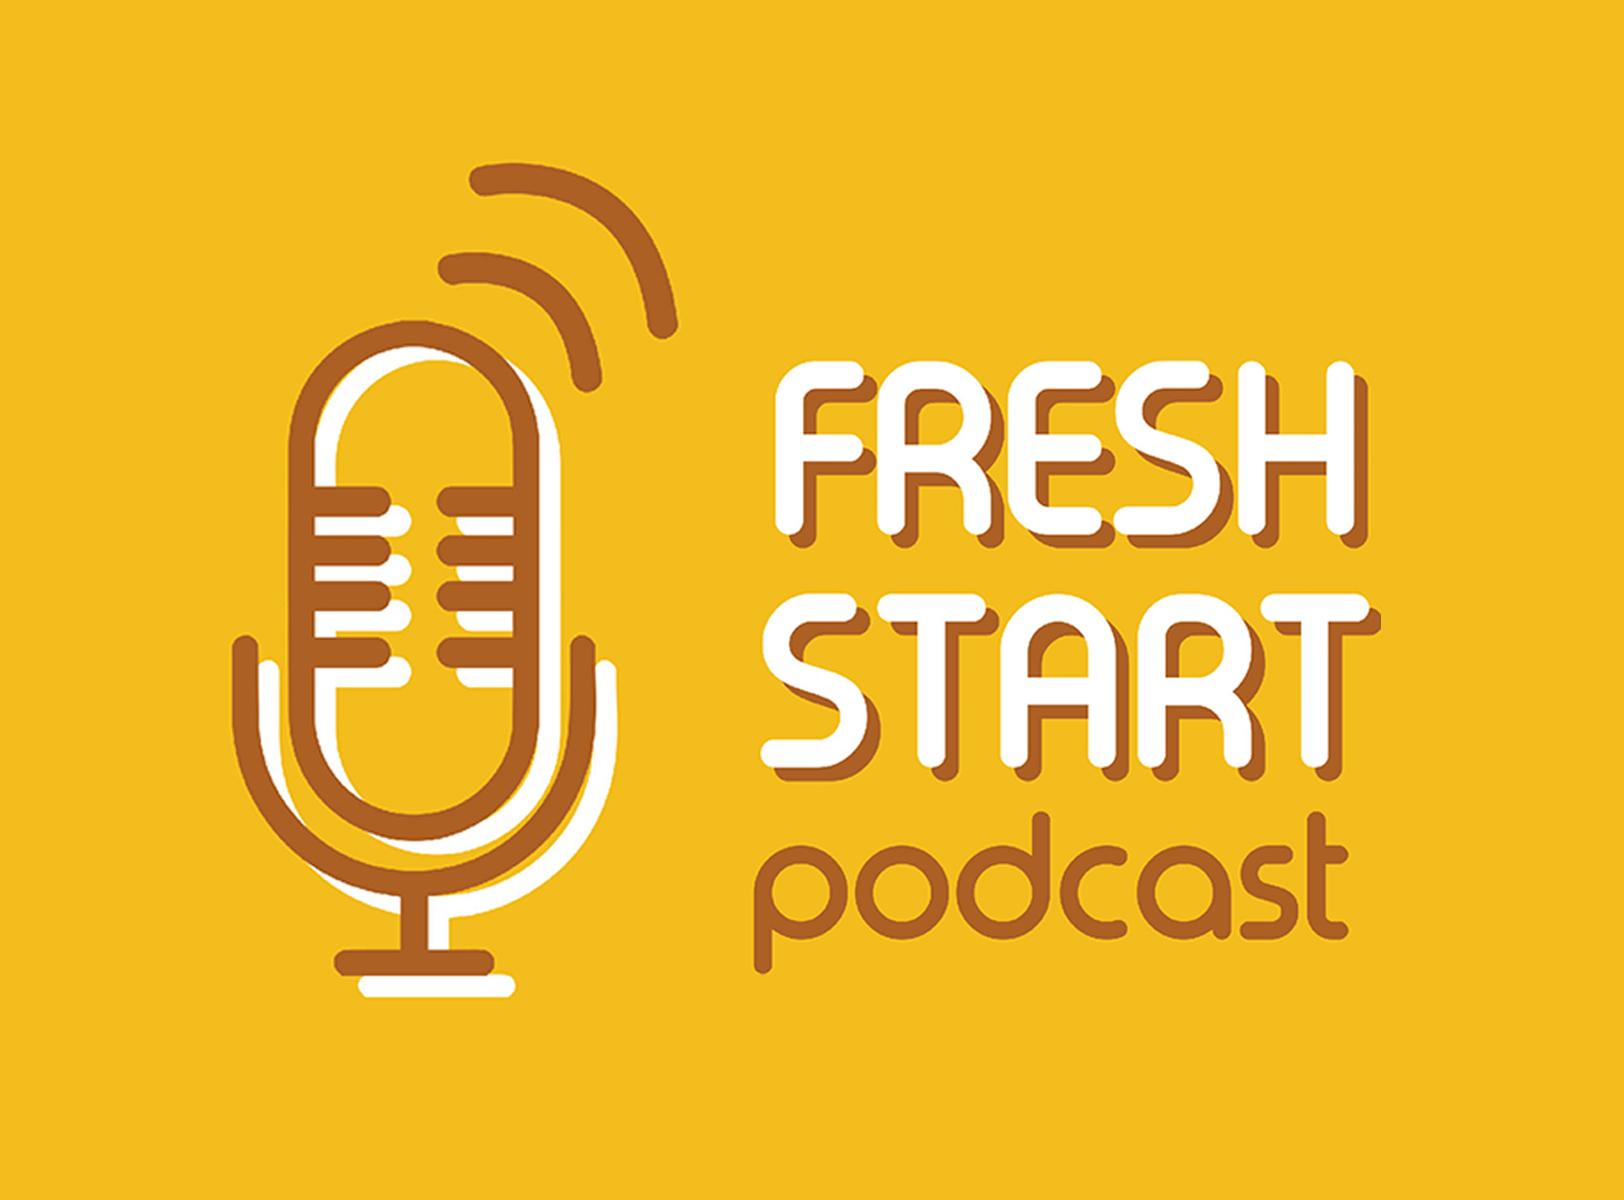 Fresh Start: Podcast News (11/27/2018 Tue.)